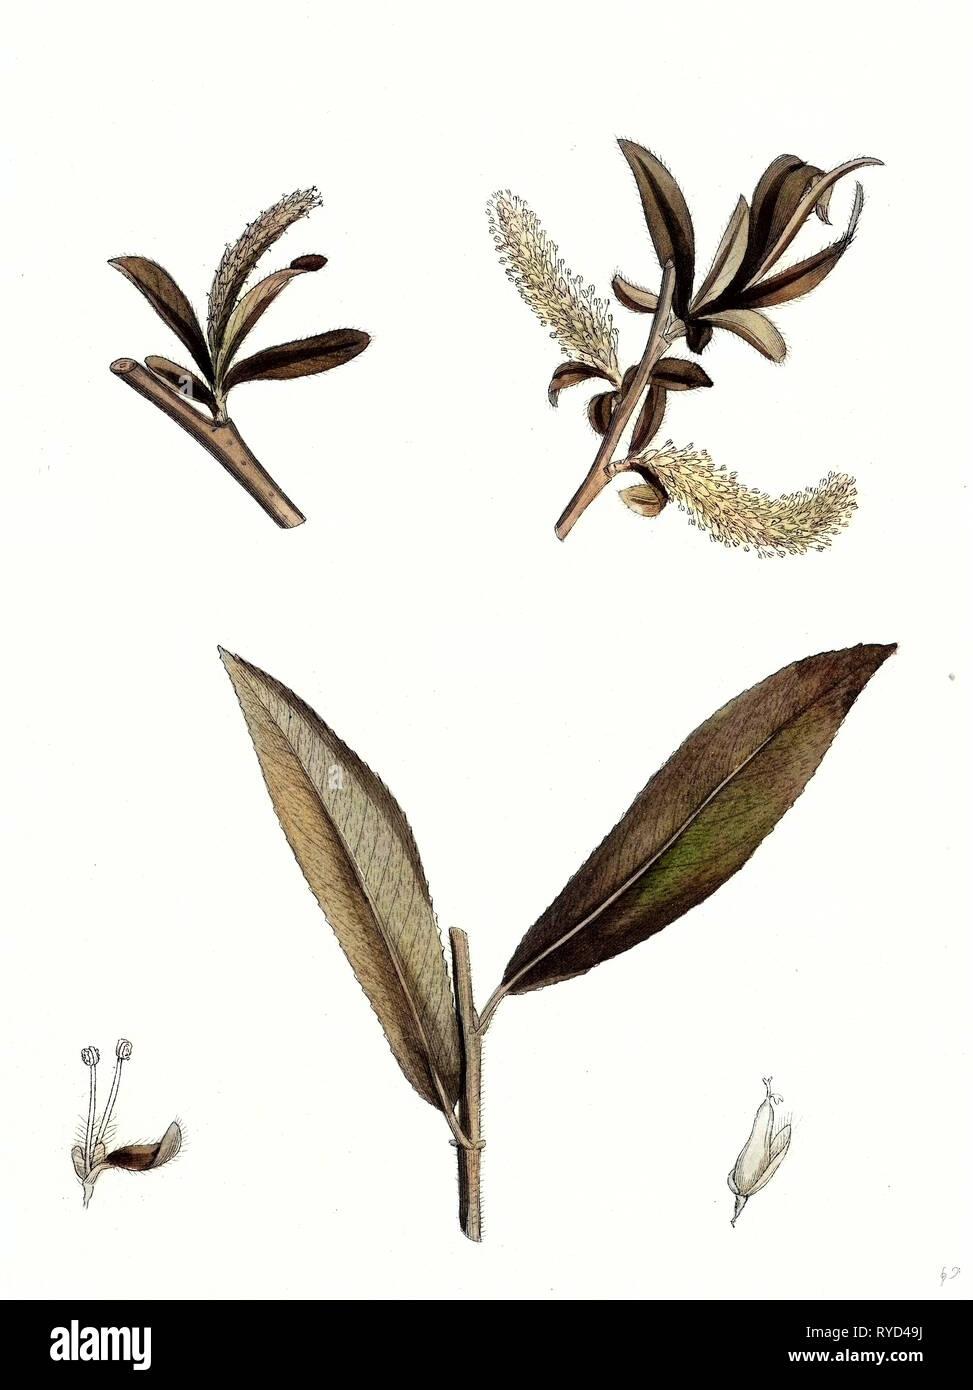 Salix Alba Var. Genuina White Willow - Stock Image